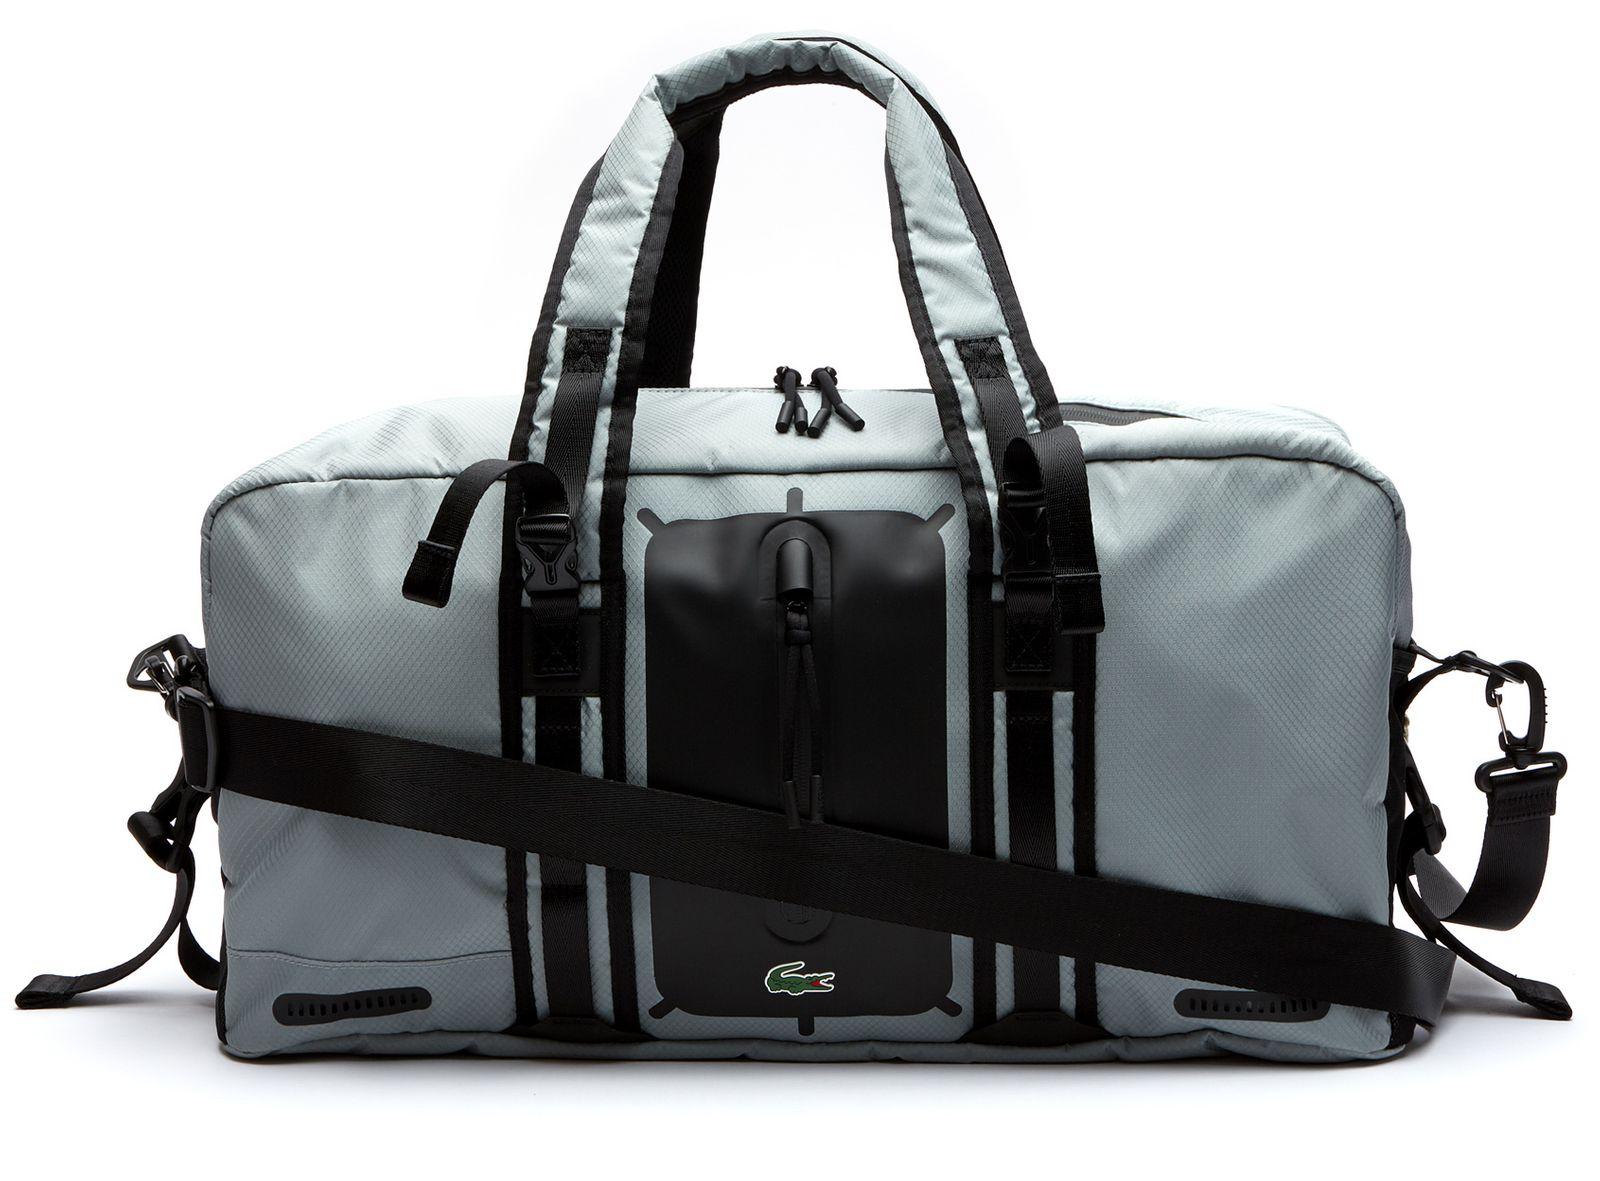 101847d1b LACOSTE-Match-Point-Gym-Bag-High-Rise-Black-153721.jpg